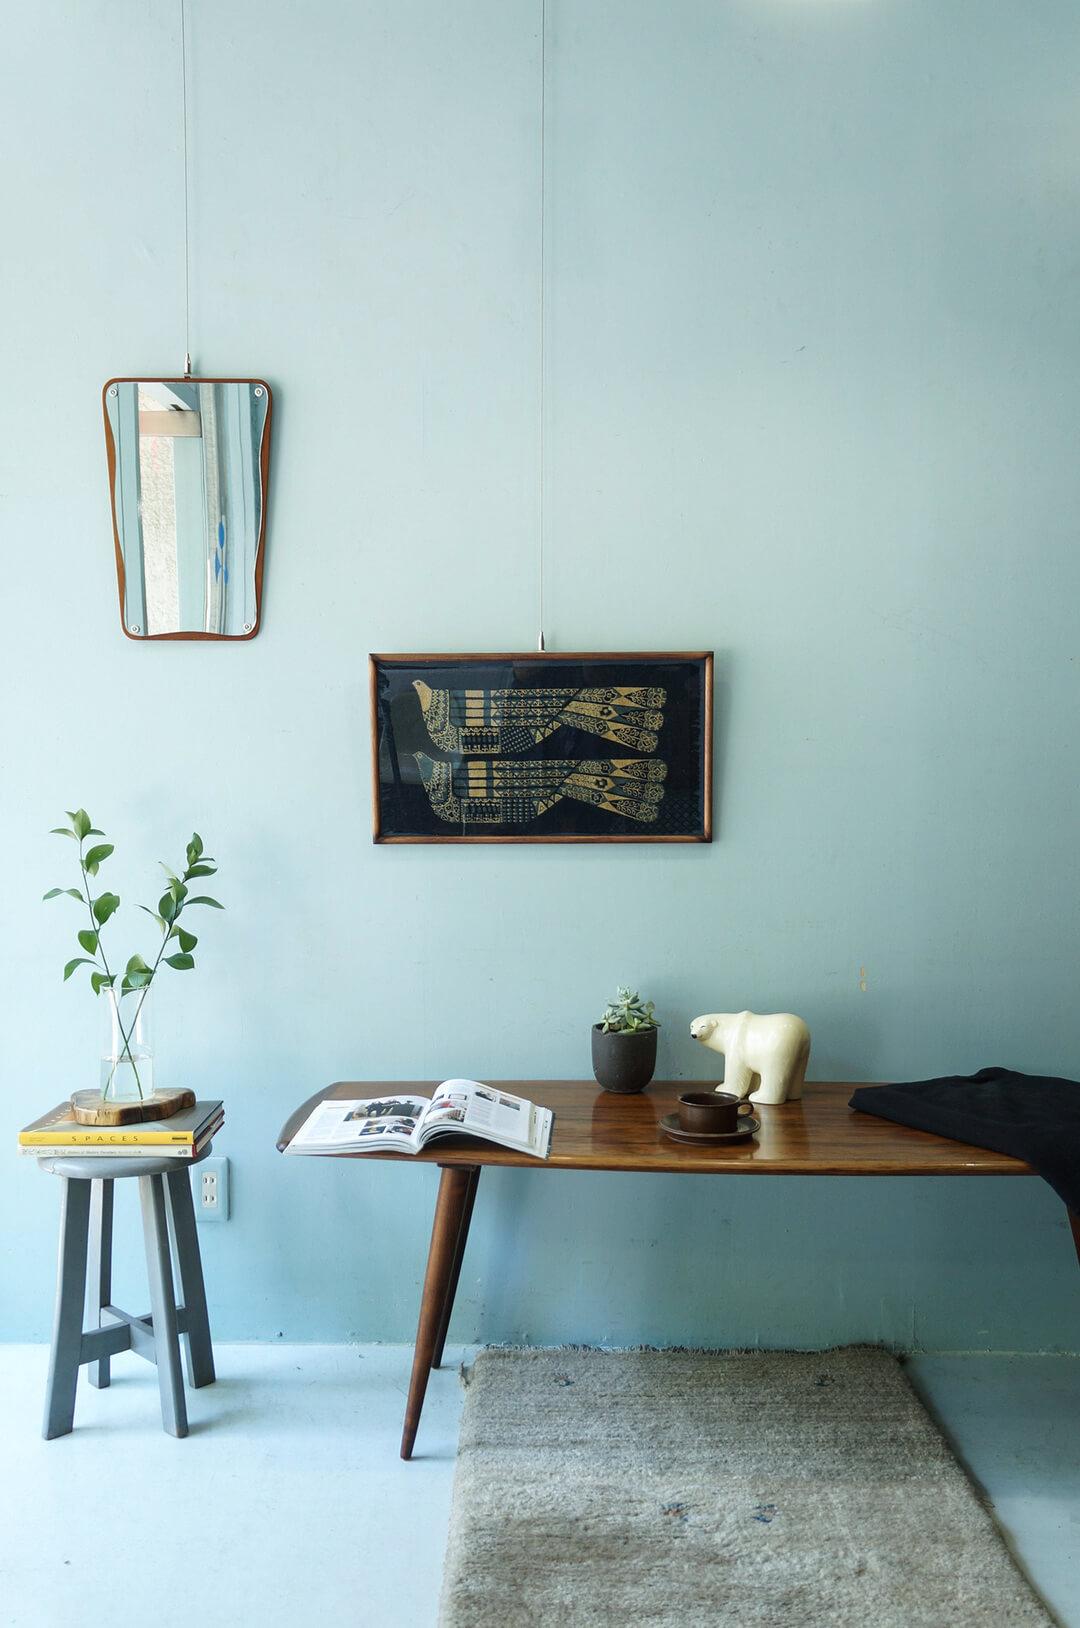 Swedish Vintage Blue Bird Tapestry Frame/スウェーデン ヴィンテージ タペストリー 青い鳥 壁掛け 額 リネン ハンドプリント 北欧雑貨